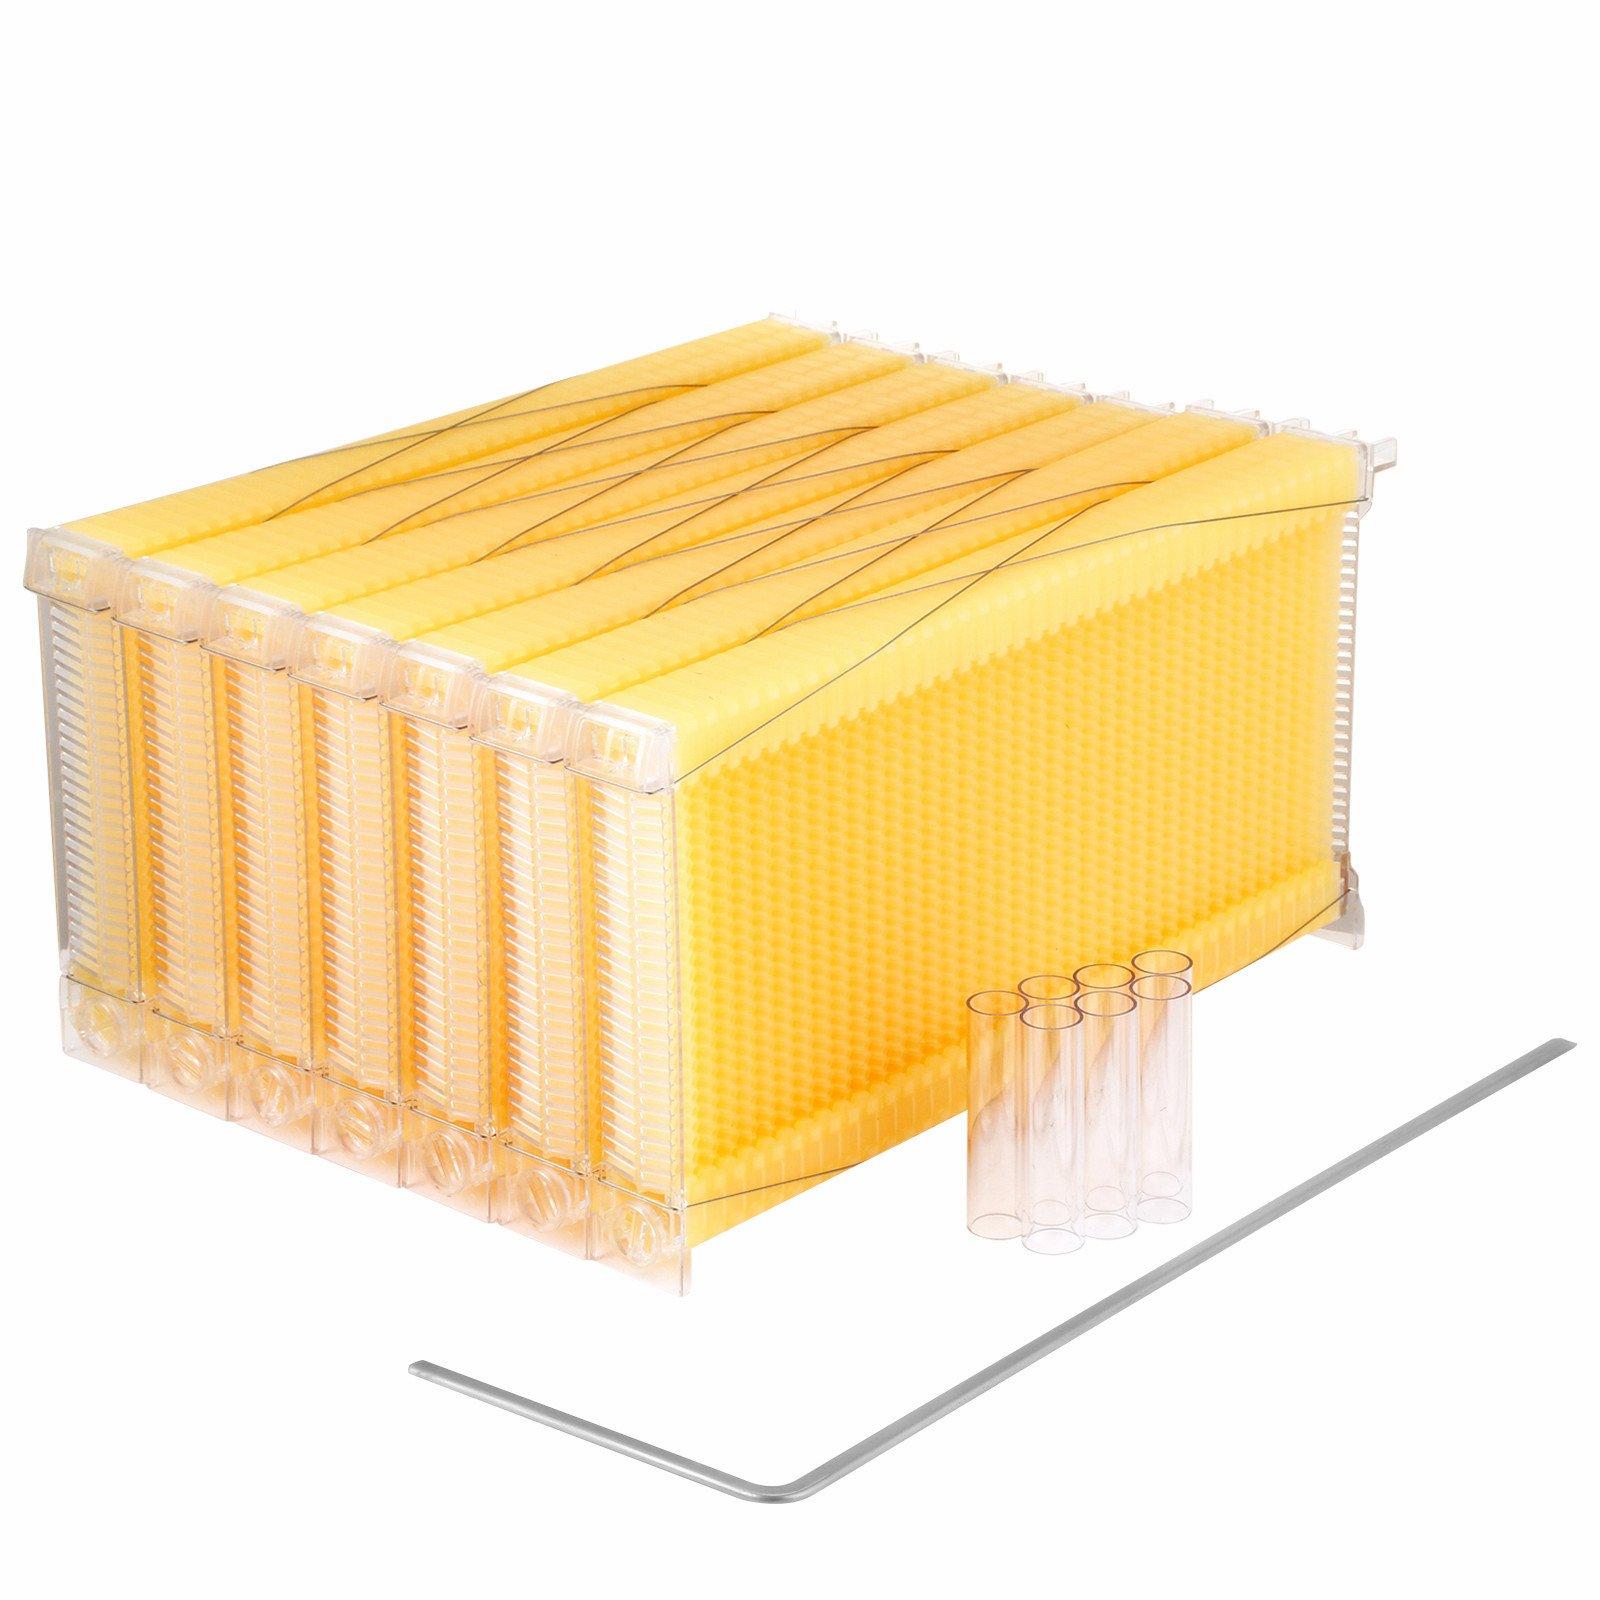 Popsport Automatic Flow Honey 7PCS Auto Flow Frames Honey Combs Food Grade Flow Honey Beehive Frames with 7 Honey Tubes for Beekeepers (Auto flow honey) by Popsport